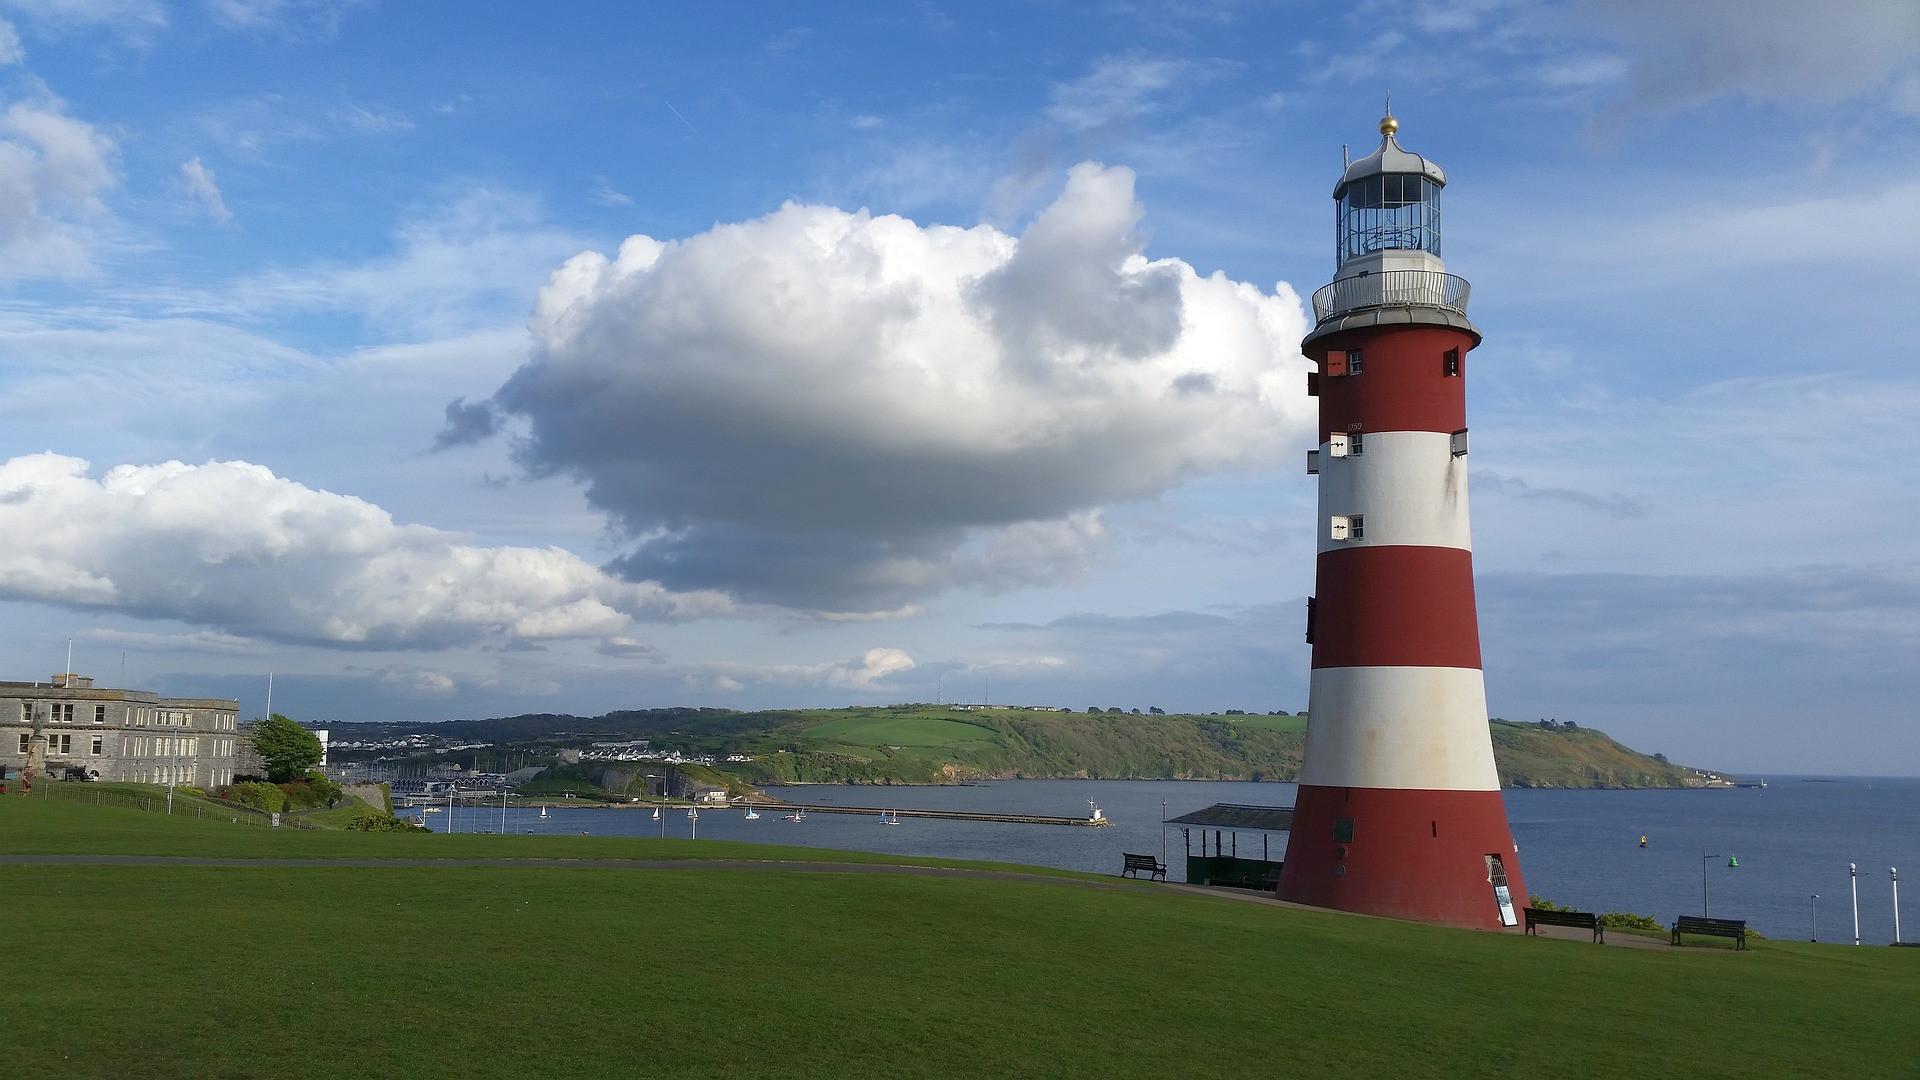 lighthouse-2275313_1920.jpg